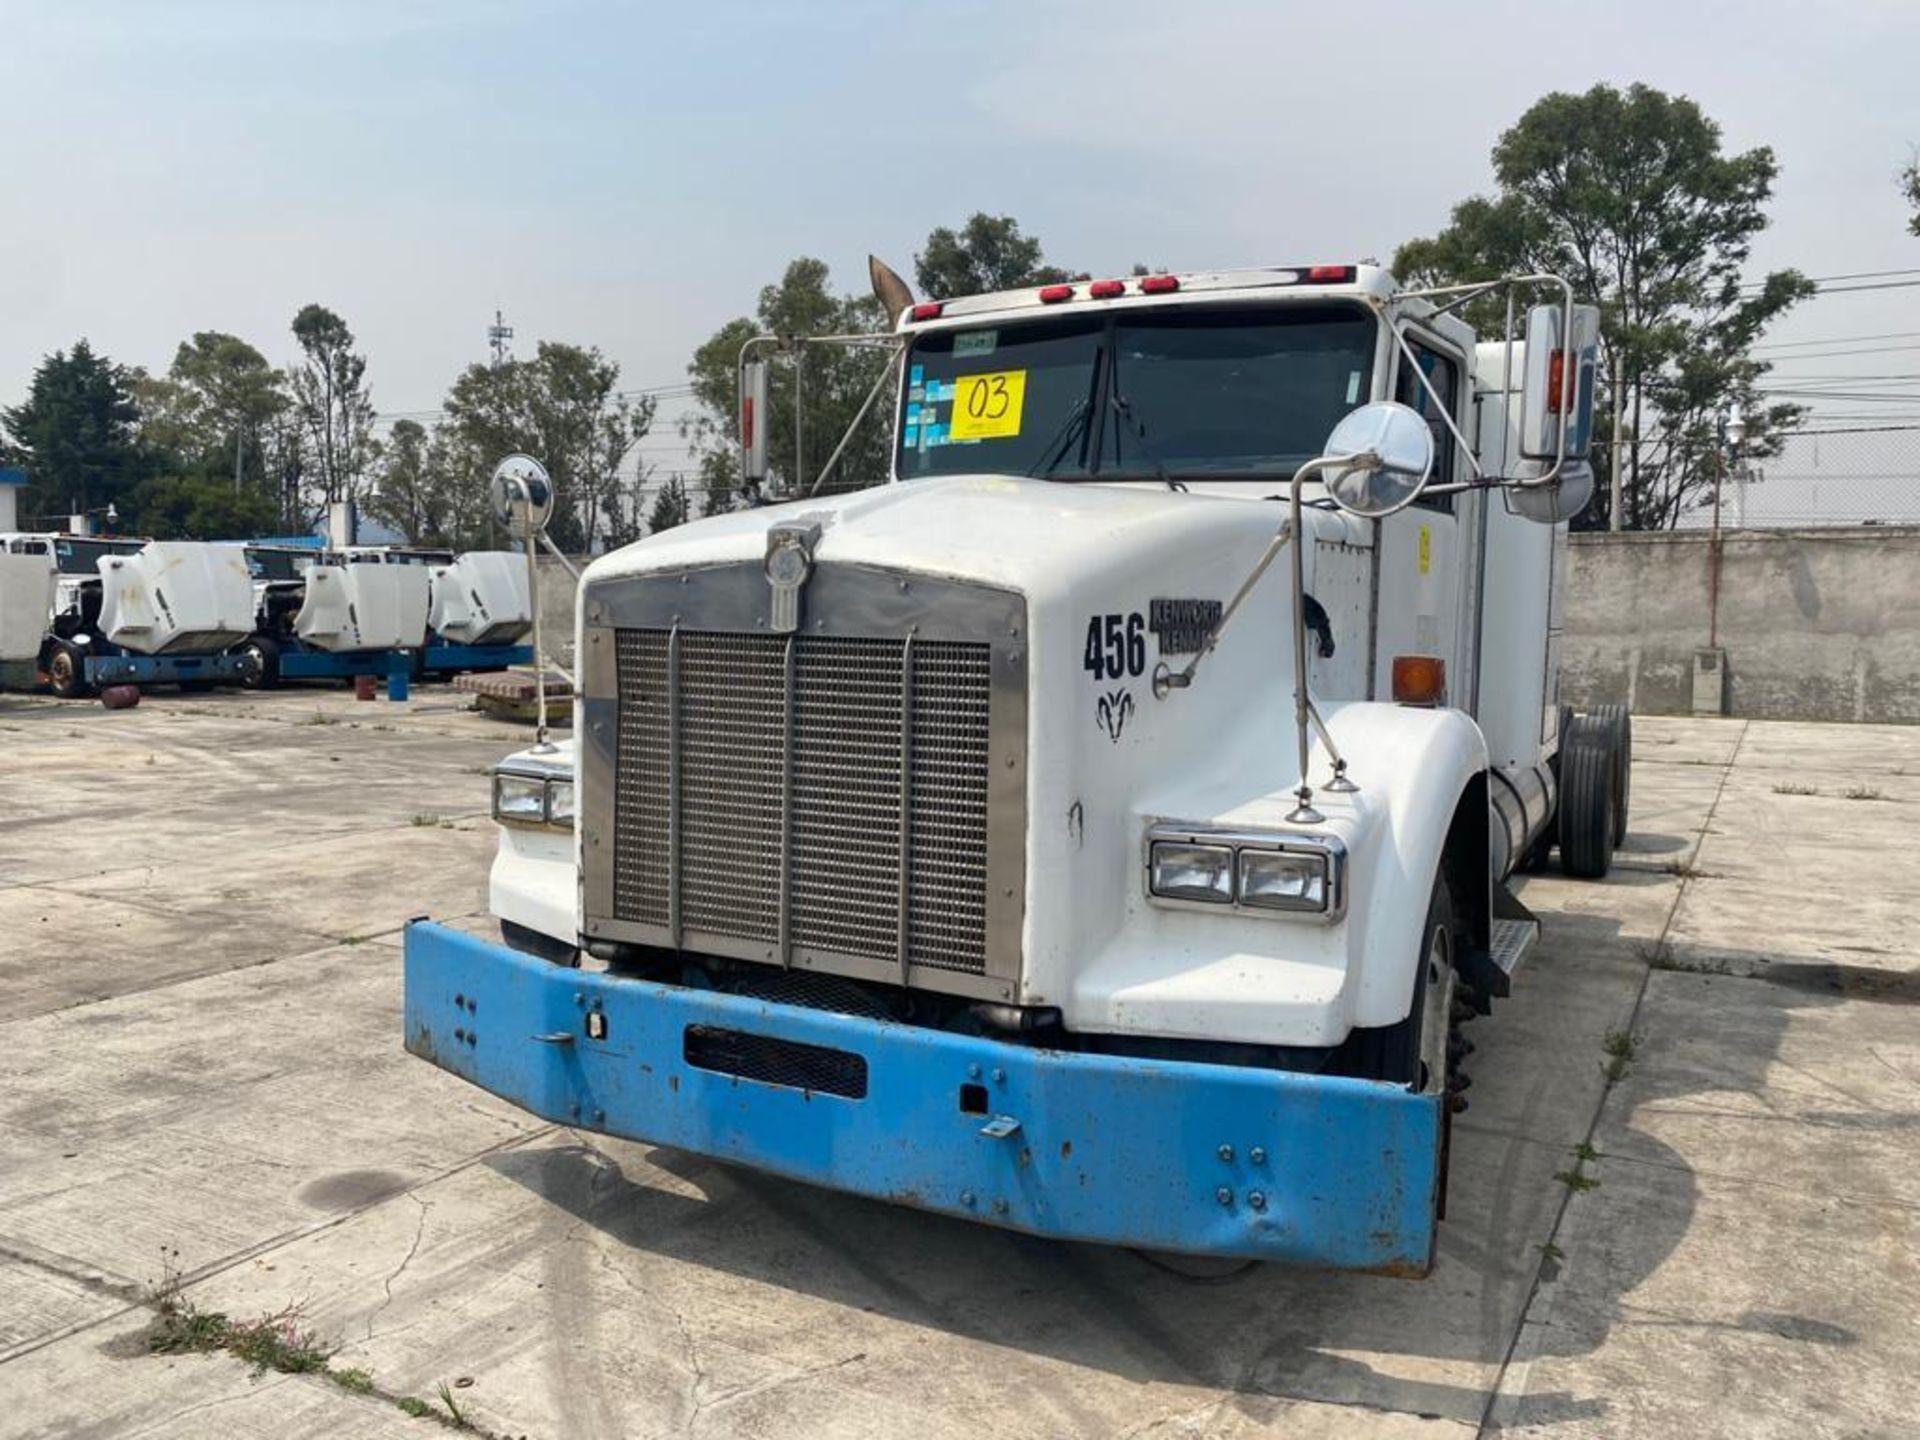 1999 Kenworth Sleeper truck tractor, standard transmission of 18 speeds - Image 5 of 62